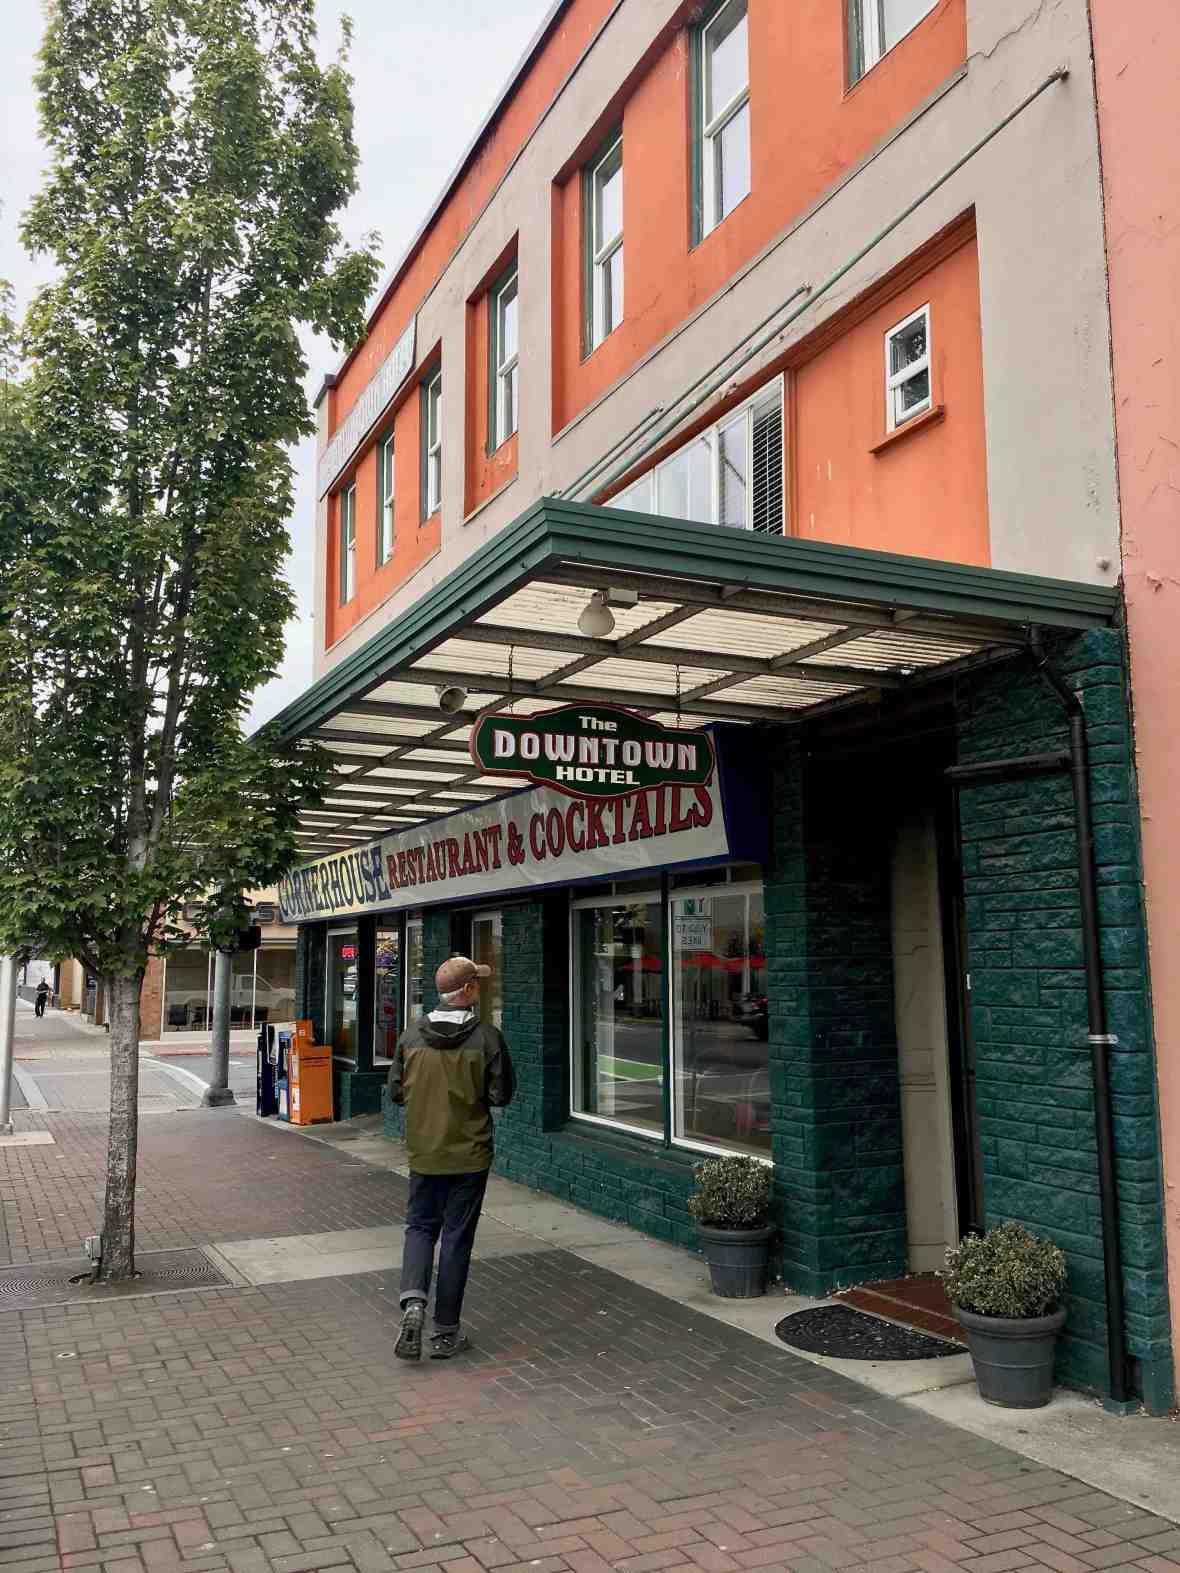 The Downtown Hotel and Cornerhouse Restaurant & Cocktails Port Angeles Washington